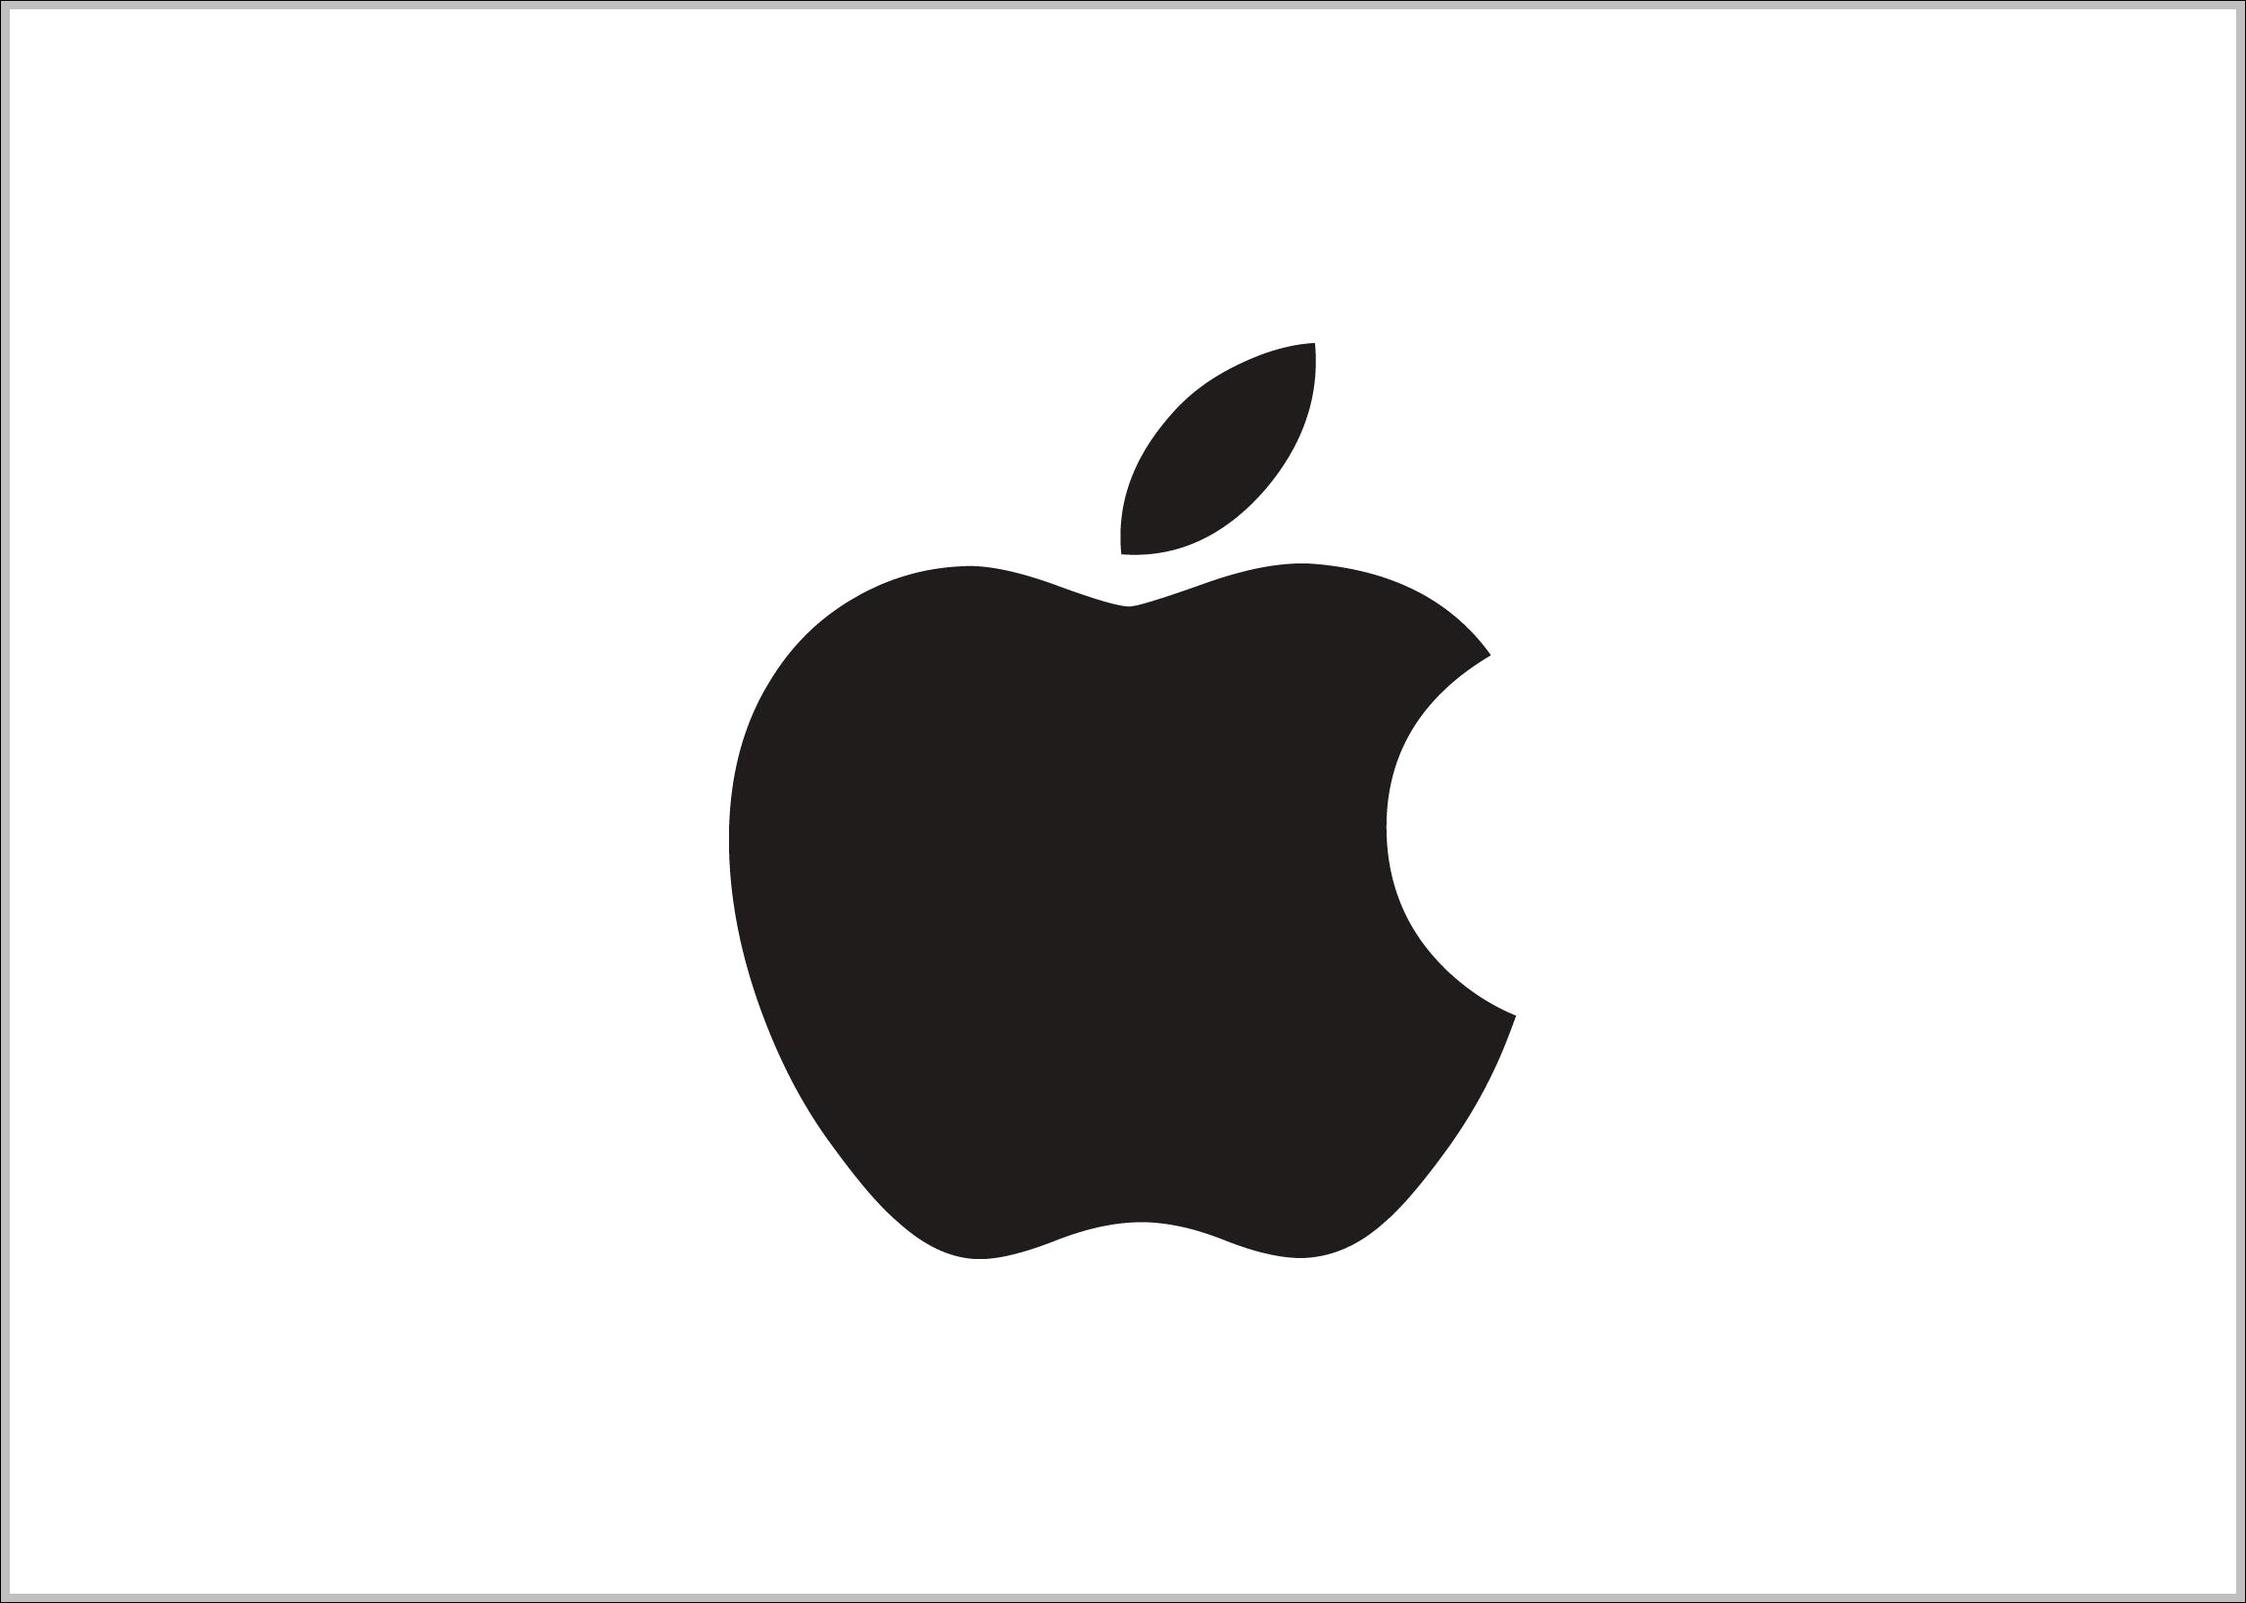 apple logo black | logo sign - logos, signs, symbols, trademarks of